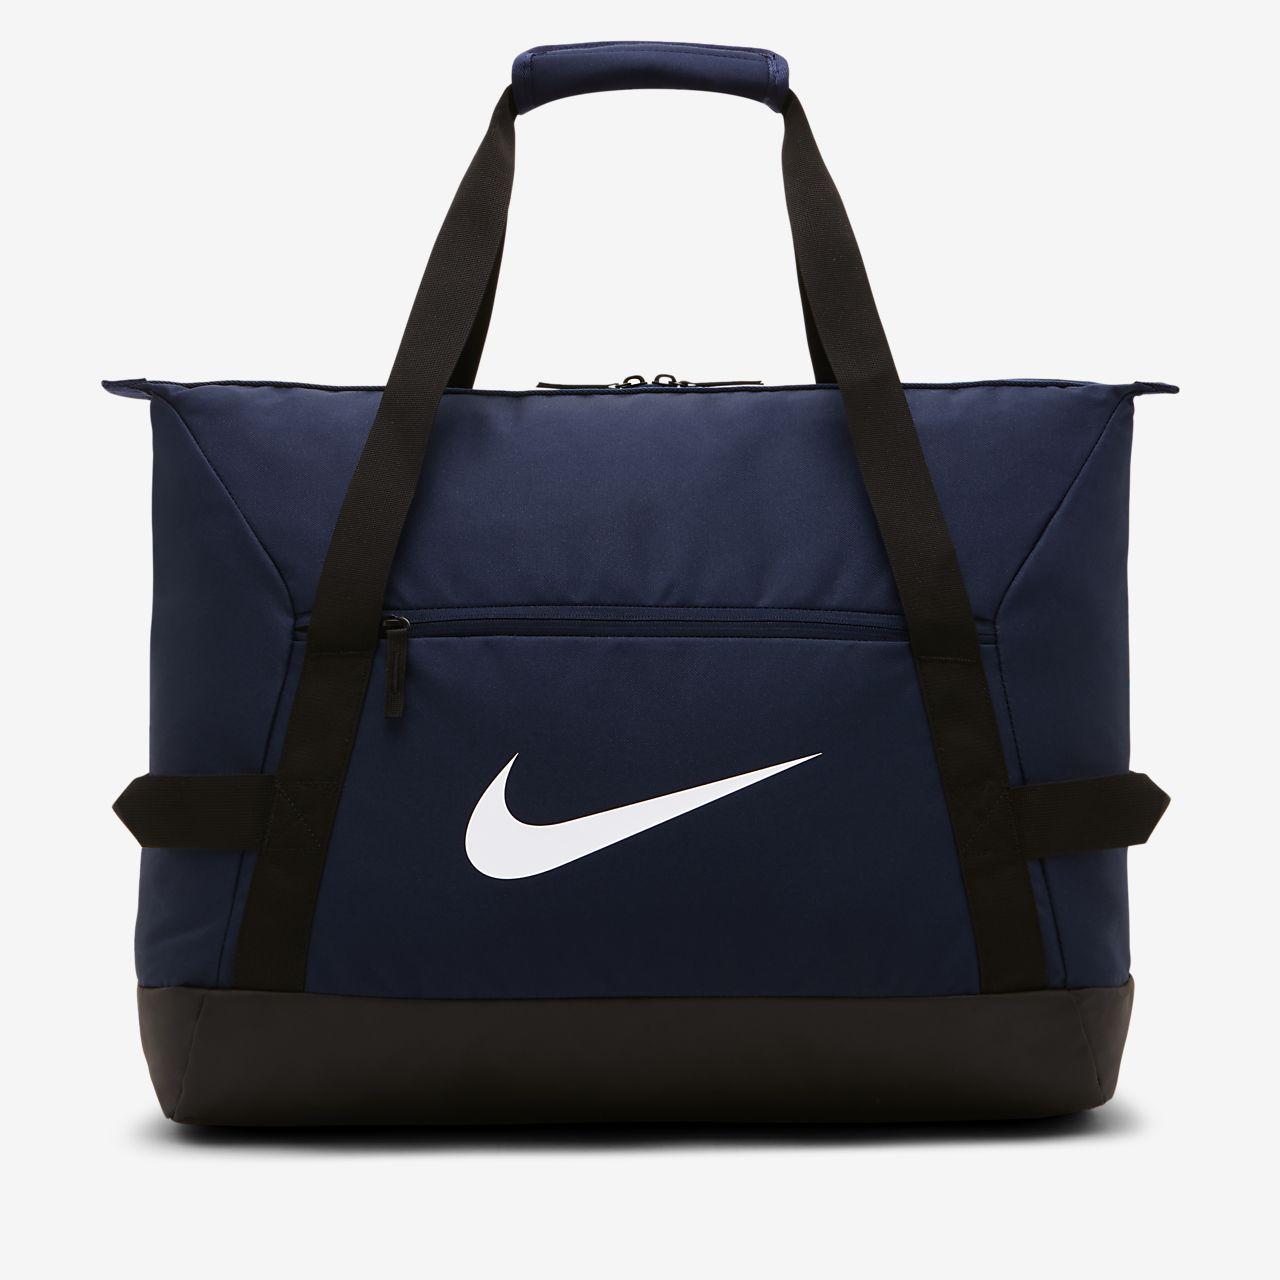 Nike Academy Team Bossa d'esport de futbol (mitjana)